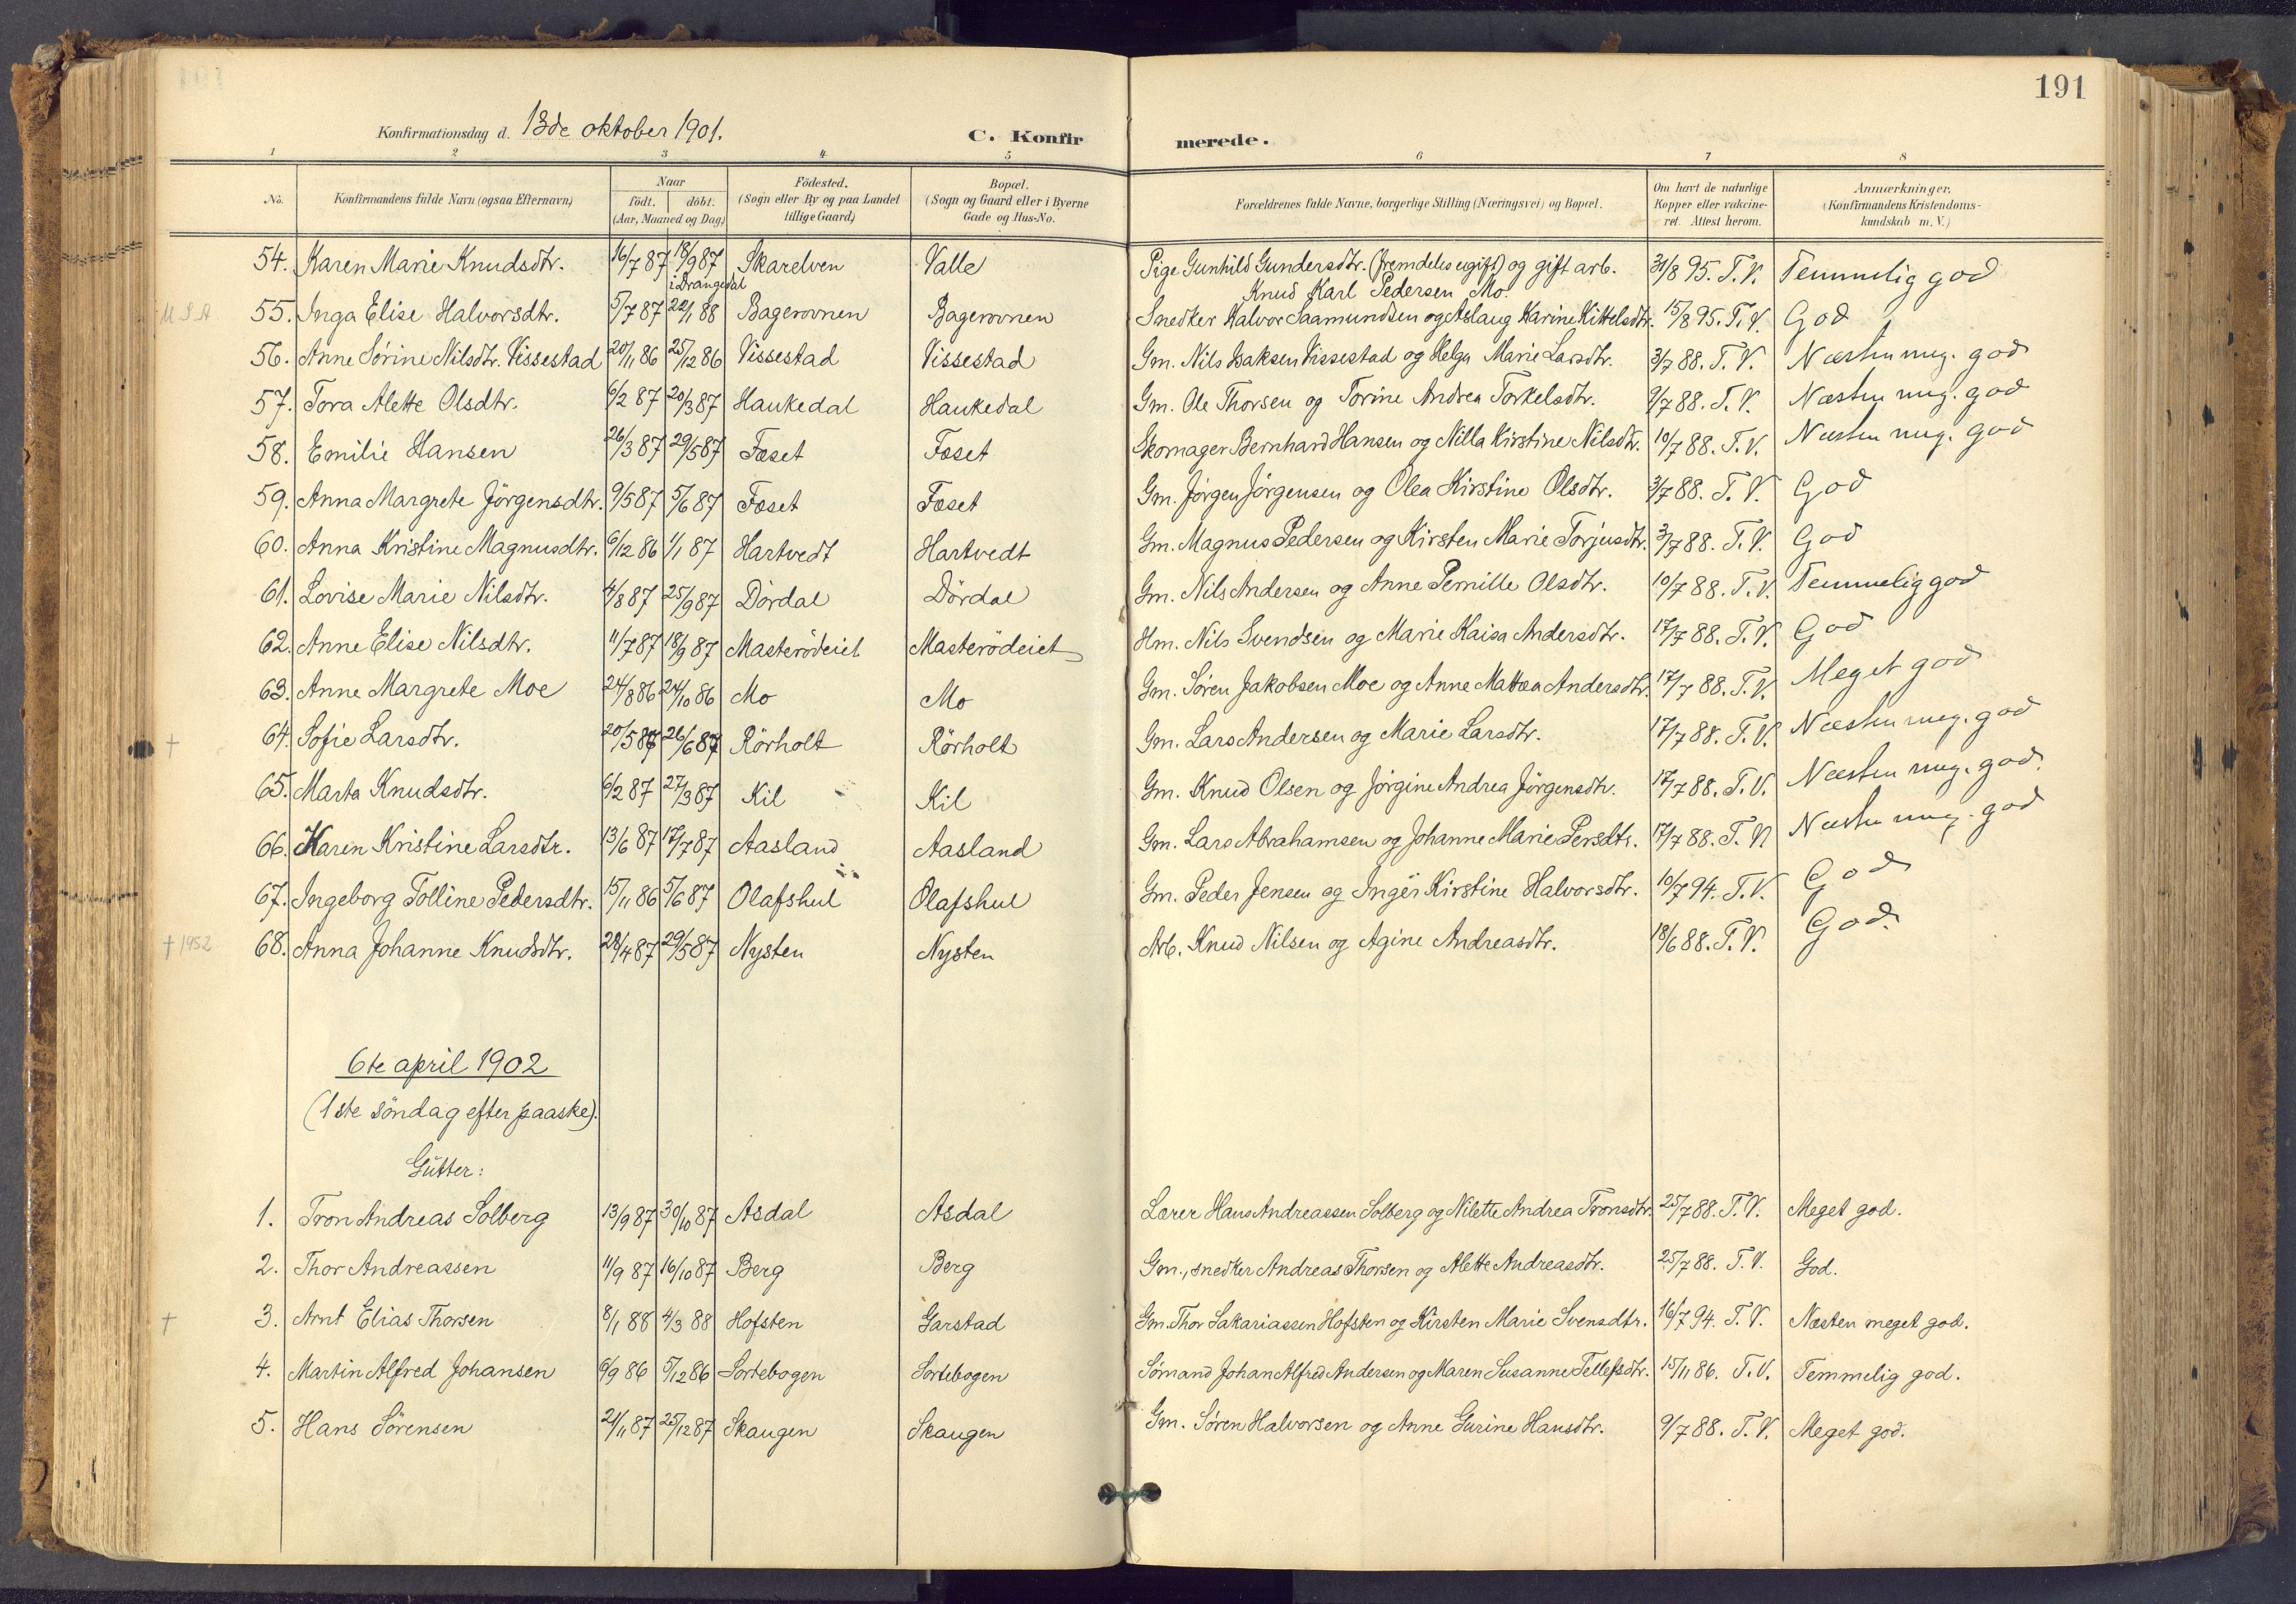 SAKO, Bamble kirkebøker, F/Fa/L0009: Ministerialbok nr. I 9, 1901-1917, s. 191